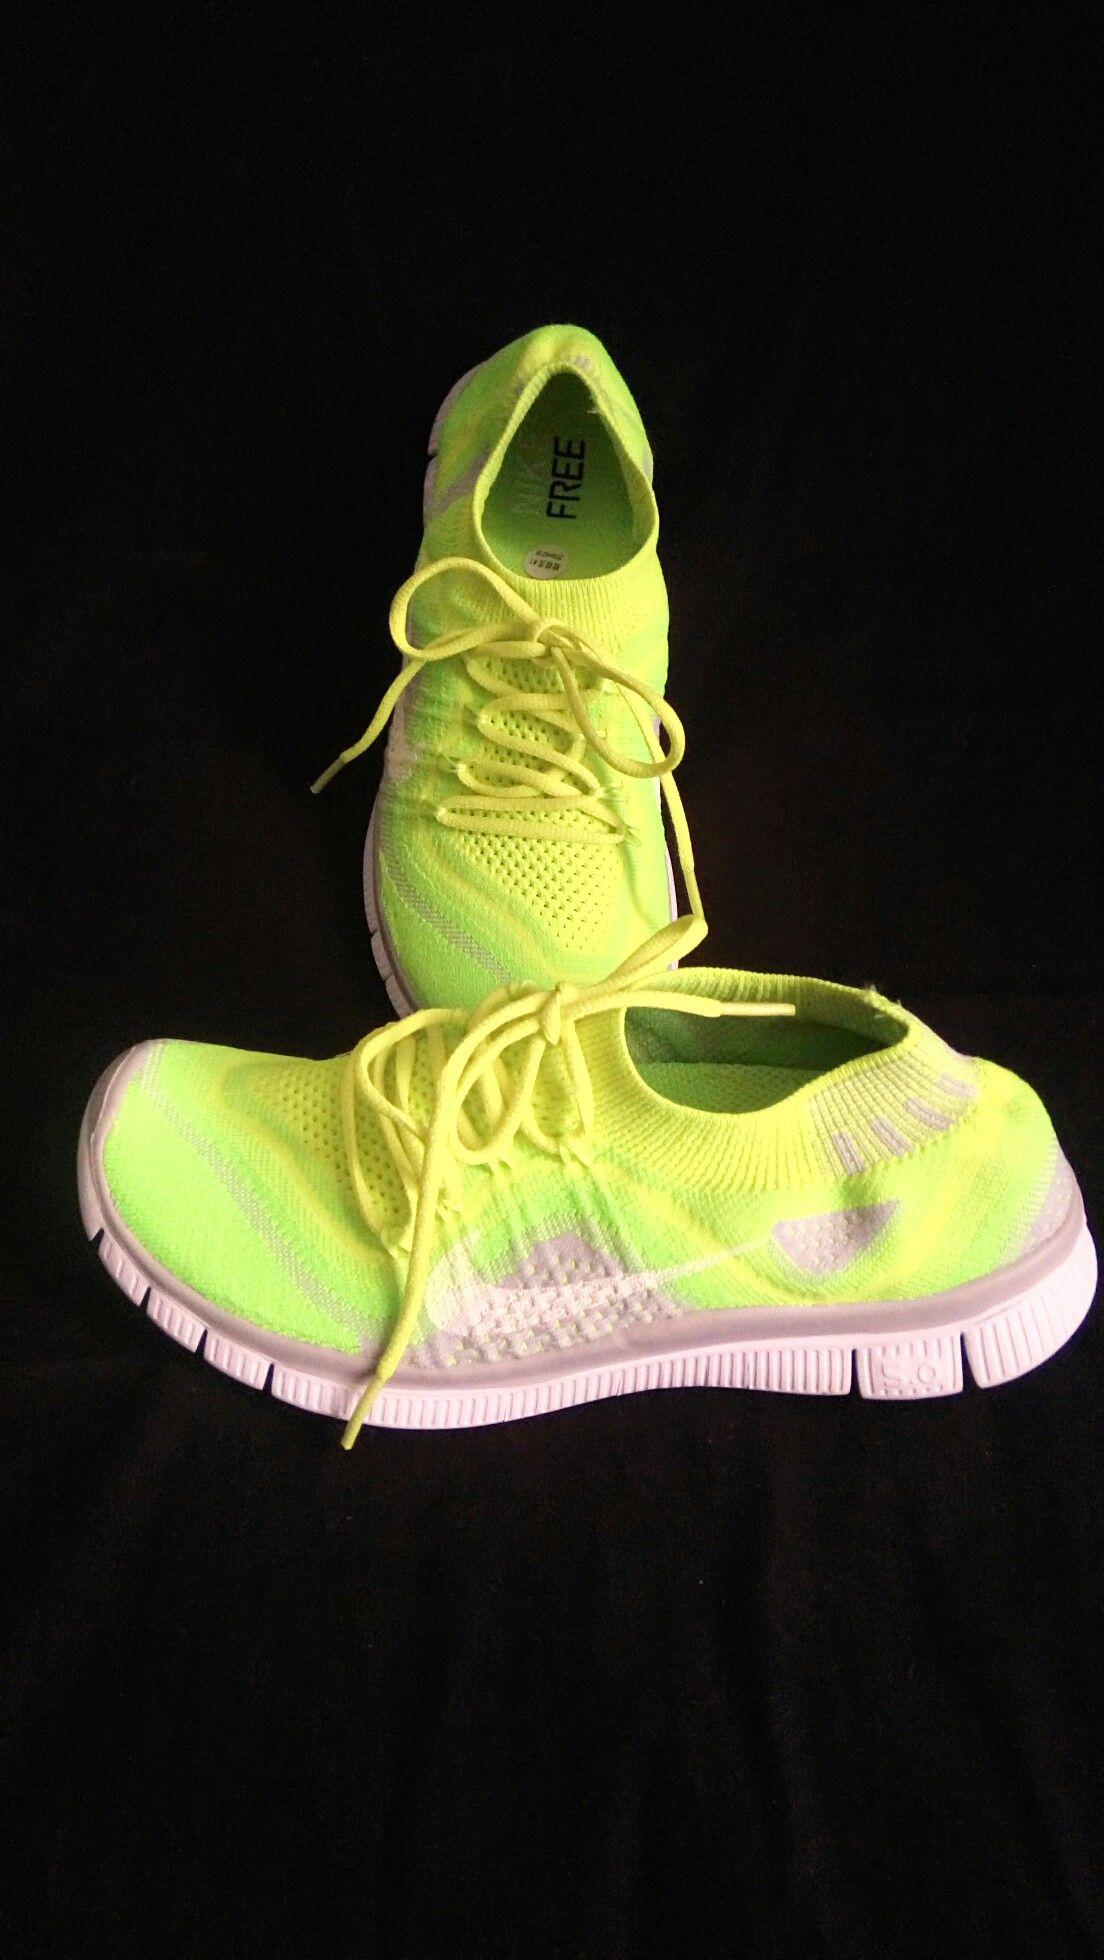 Nike amarillas ajustables | Love shoes | Nike amarillas